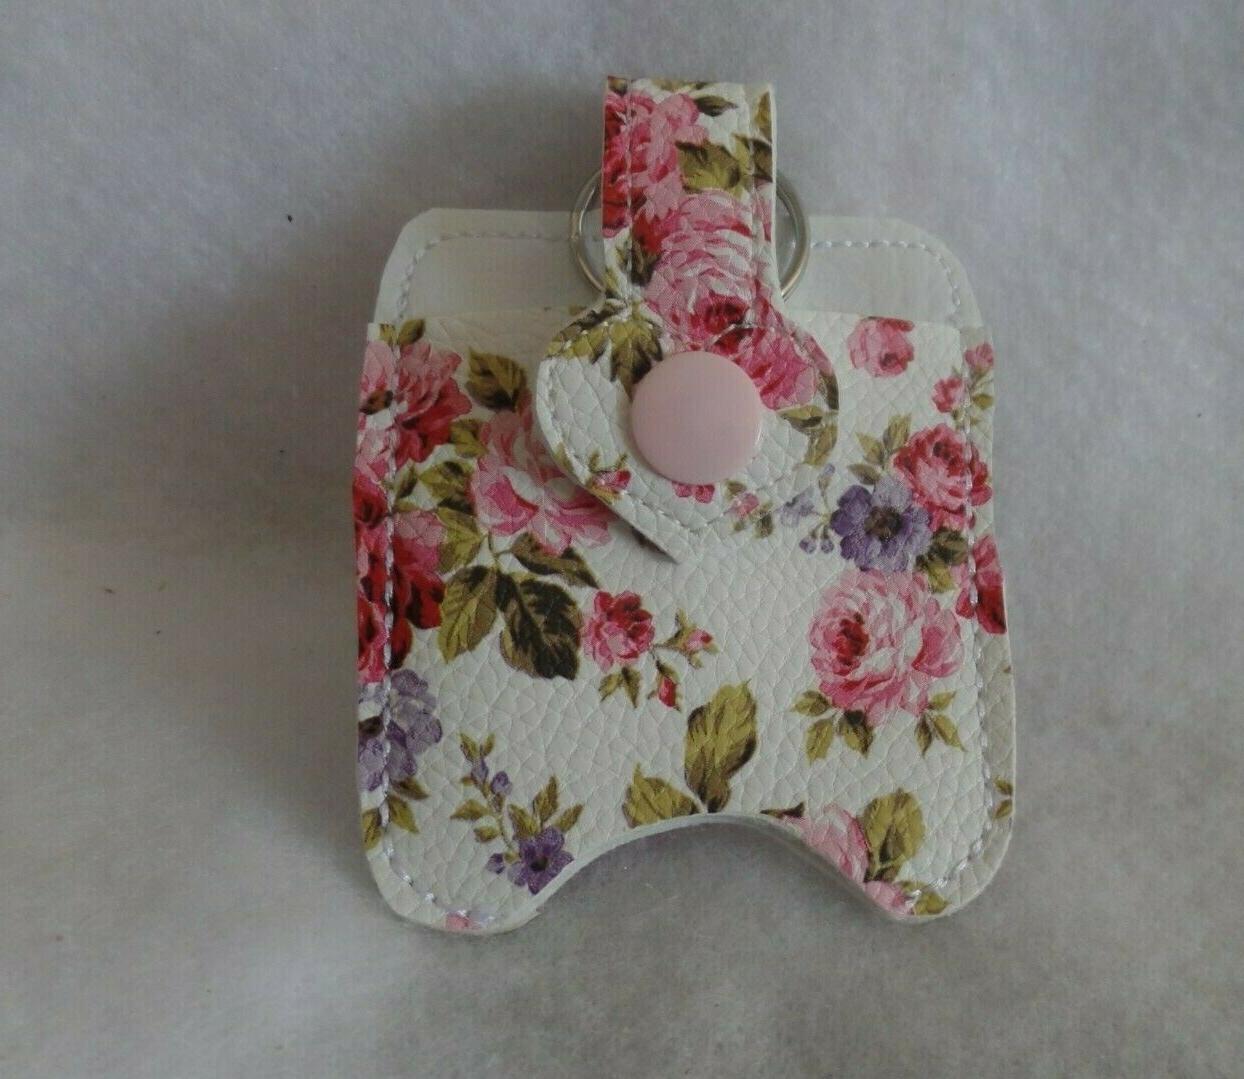 flowered pink hand sanitizer holder free shipping